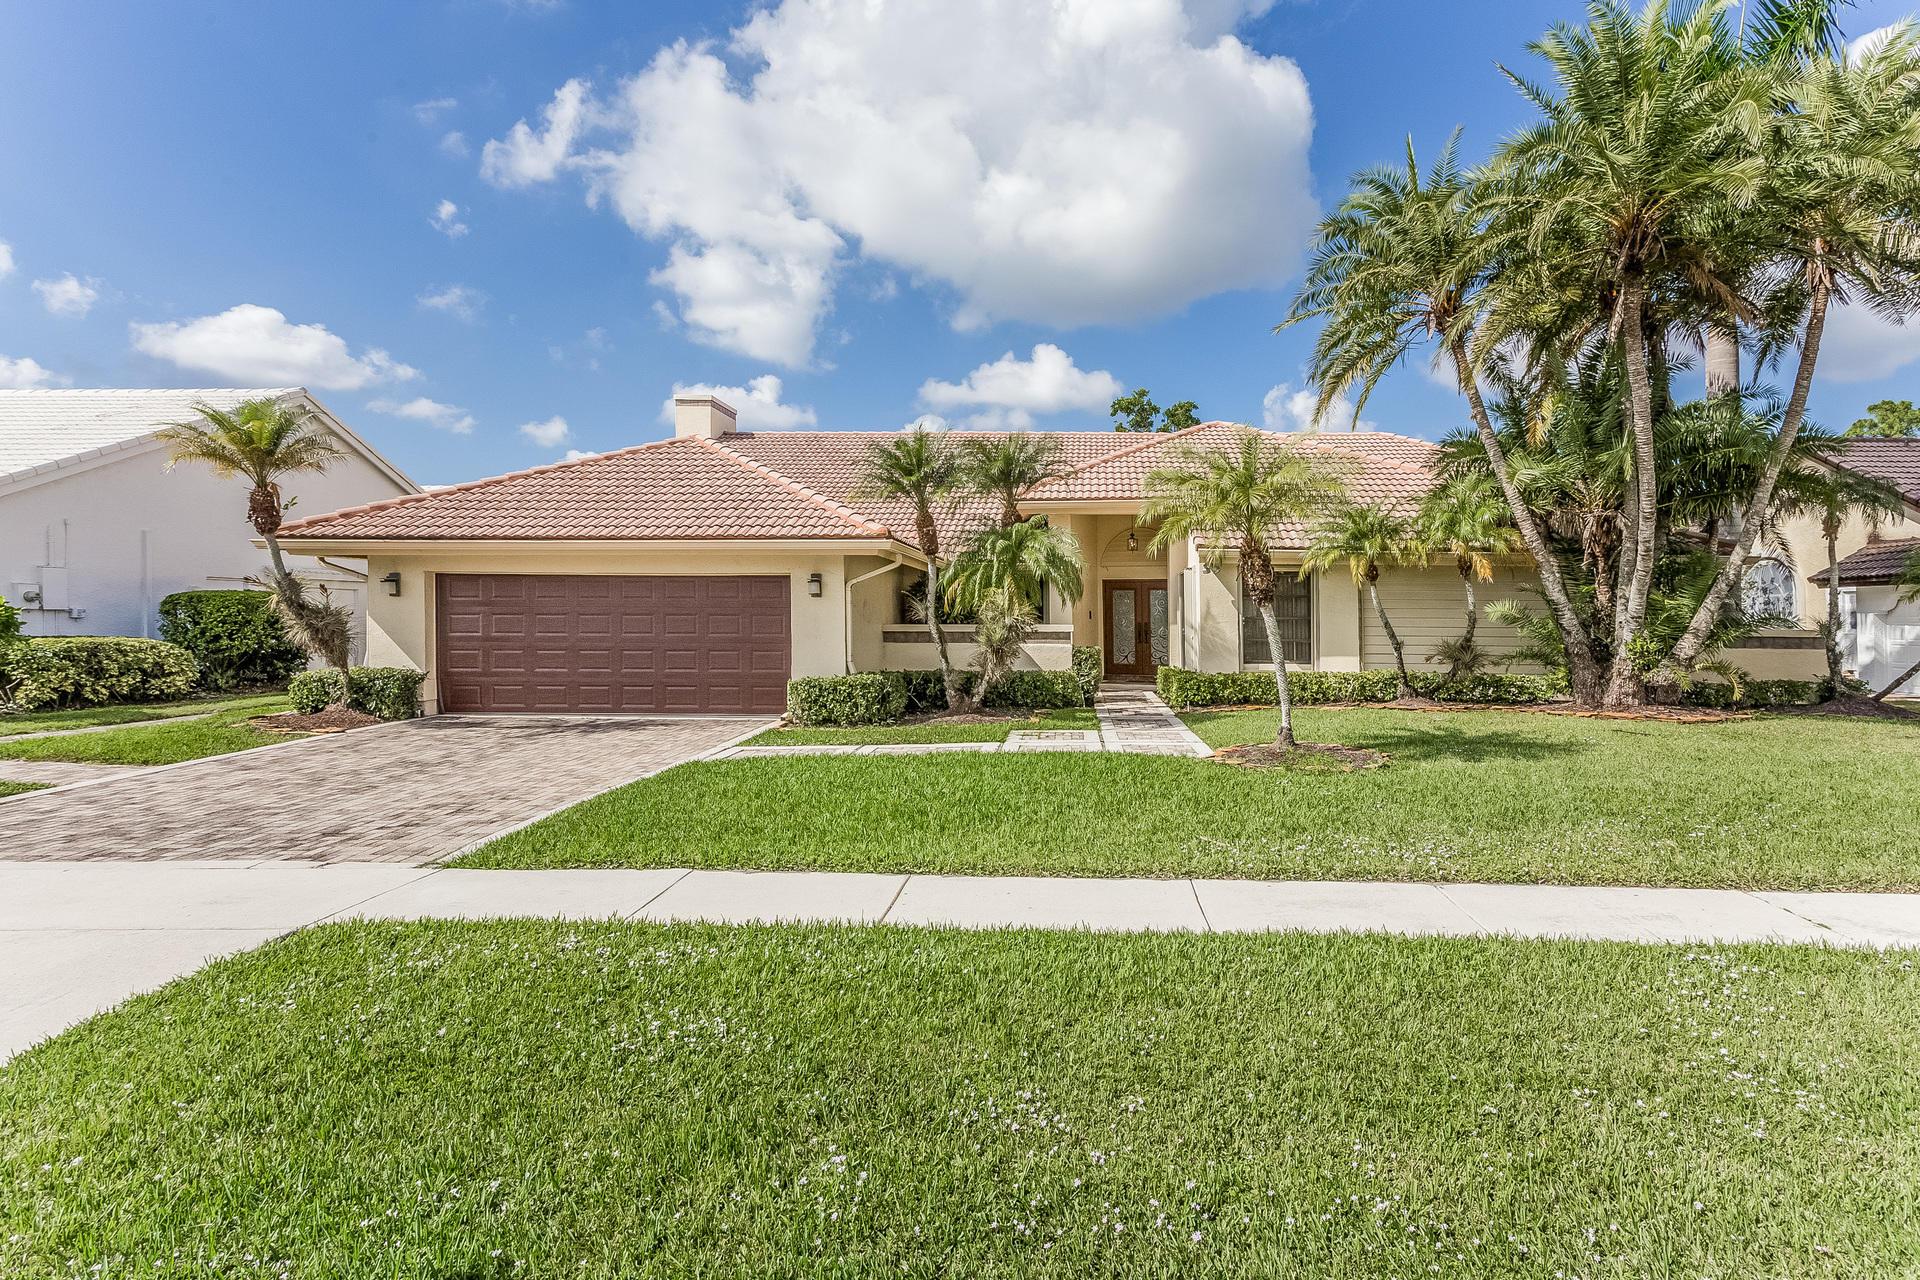 10916 Boca Woods Lane Boca Raton, FL 33428